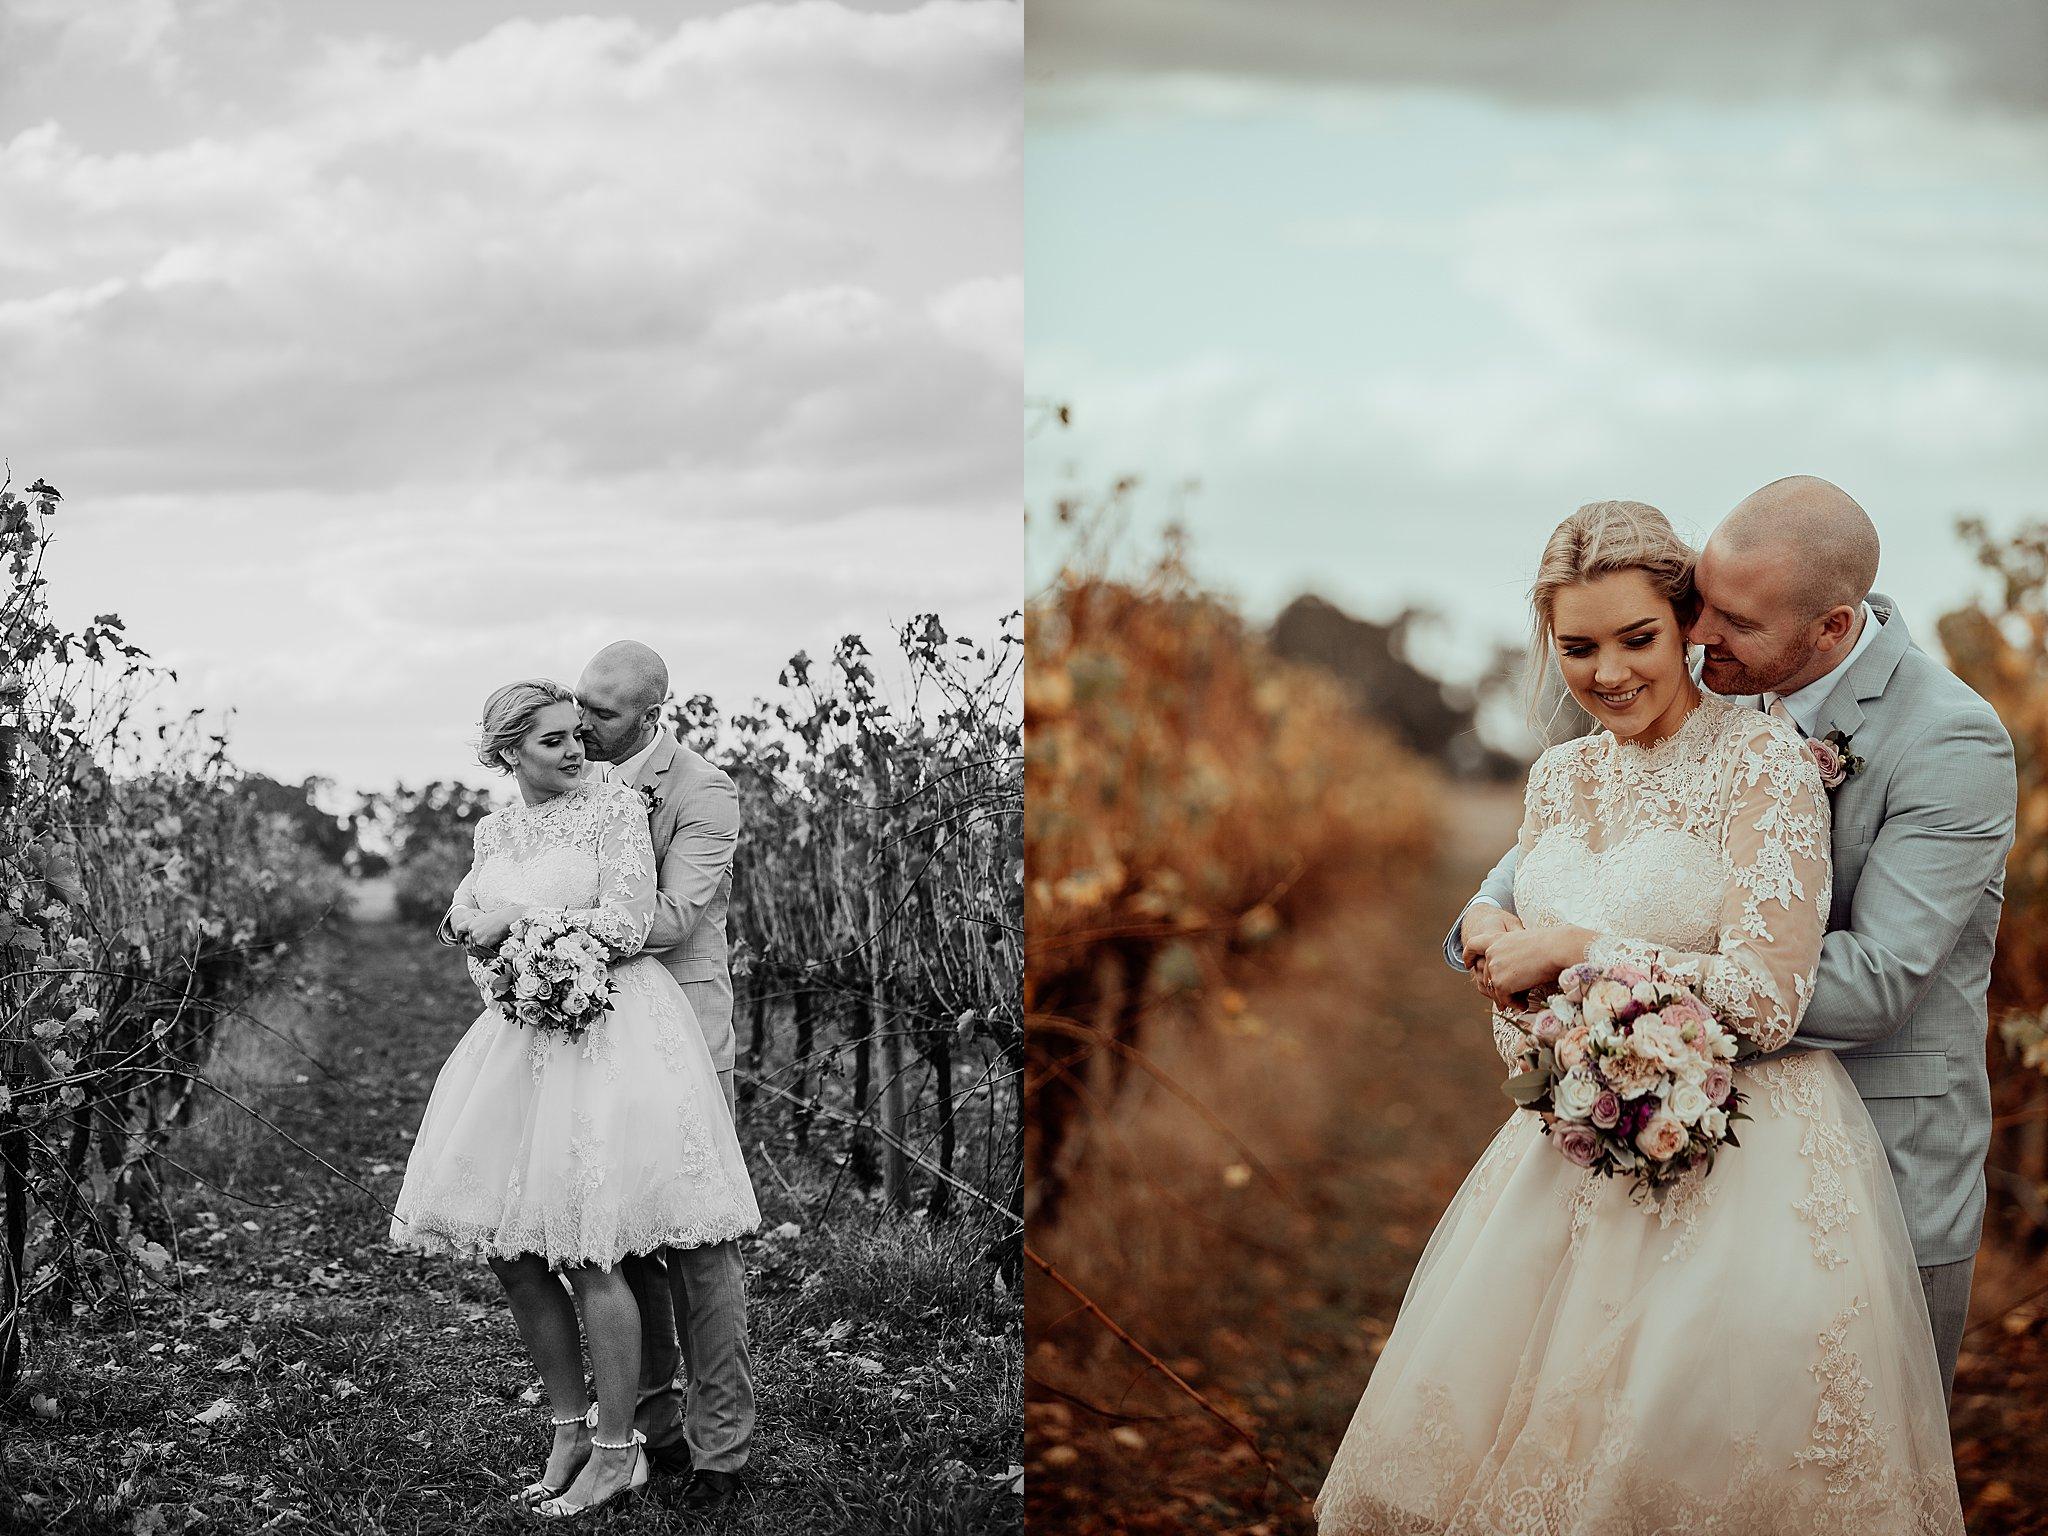 mickalathomas_puremacphotography_weddingphotographer_couplephotographer_Sheppartonphotographer_3441.jpg